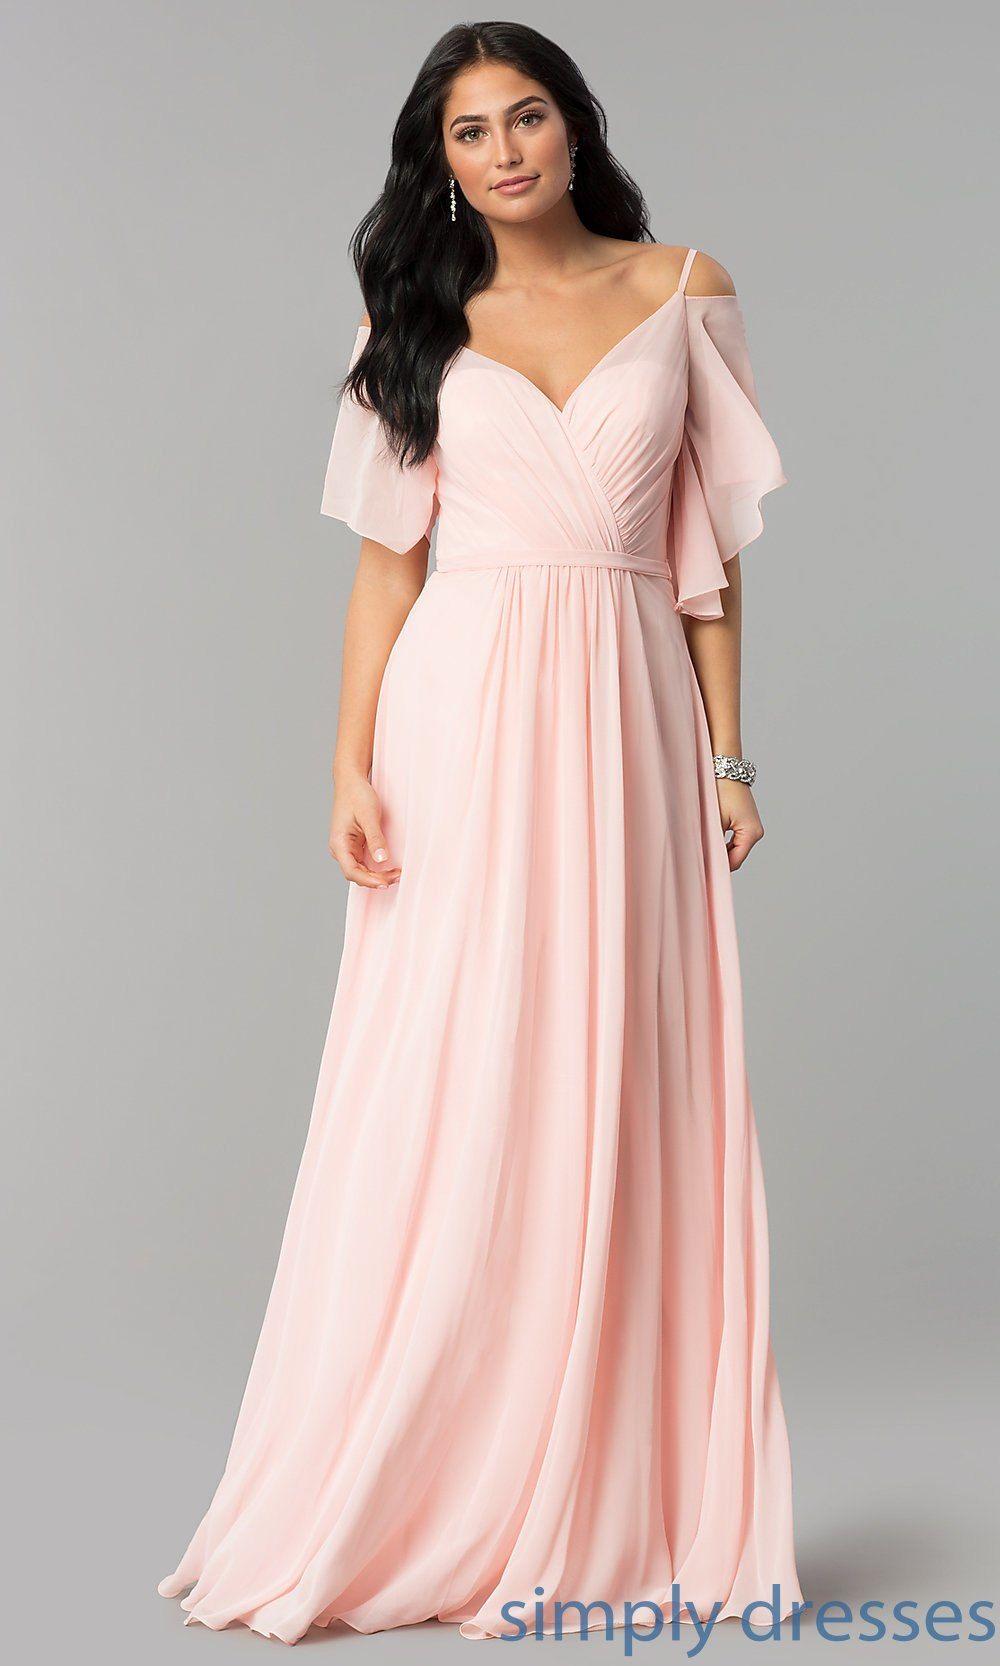 2019 year lifestyle- Prom beautiful dresses under 200